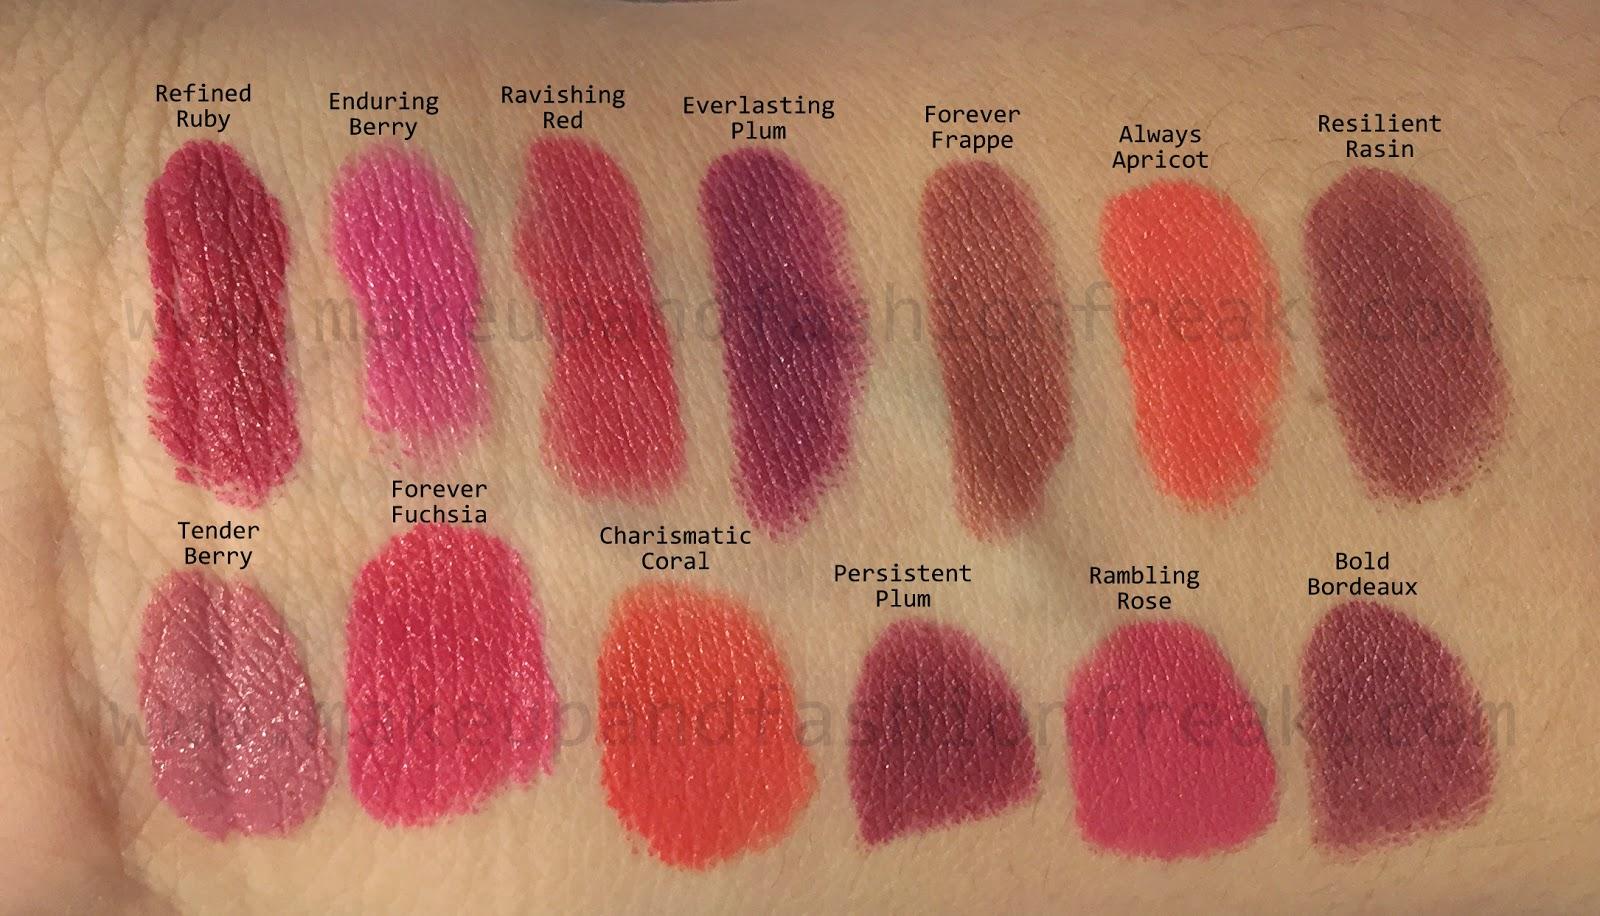 Infallible Pro Matte Liquid Lipstick by L'Oreal #14